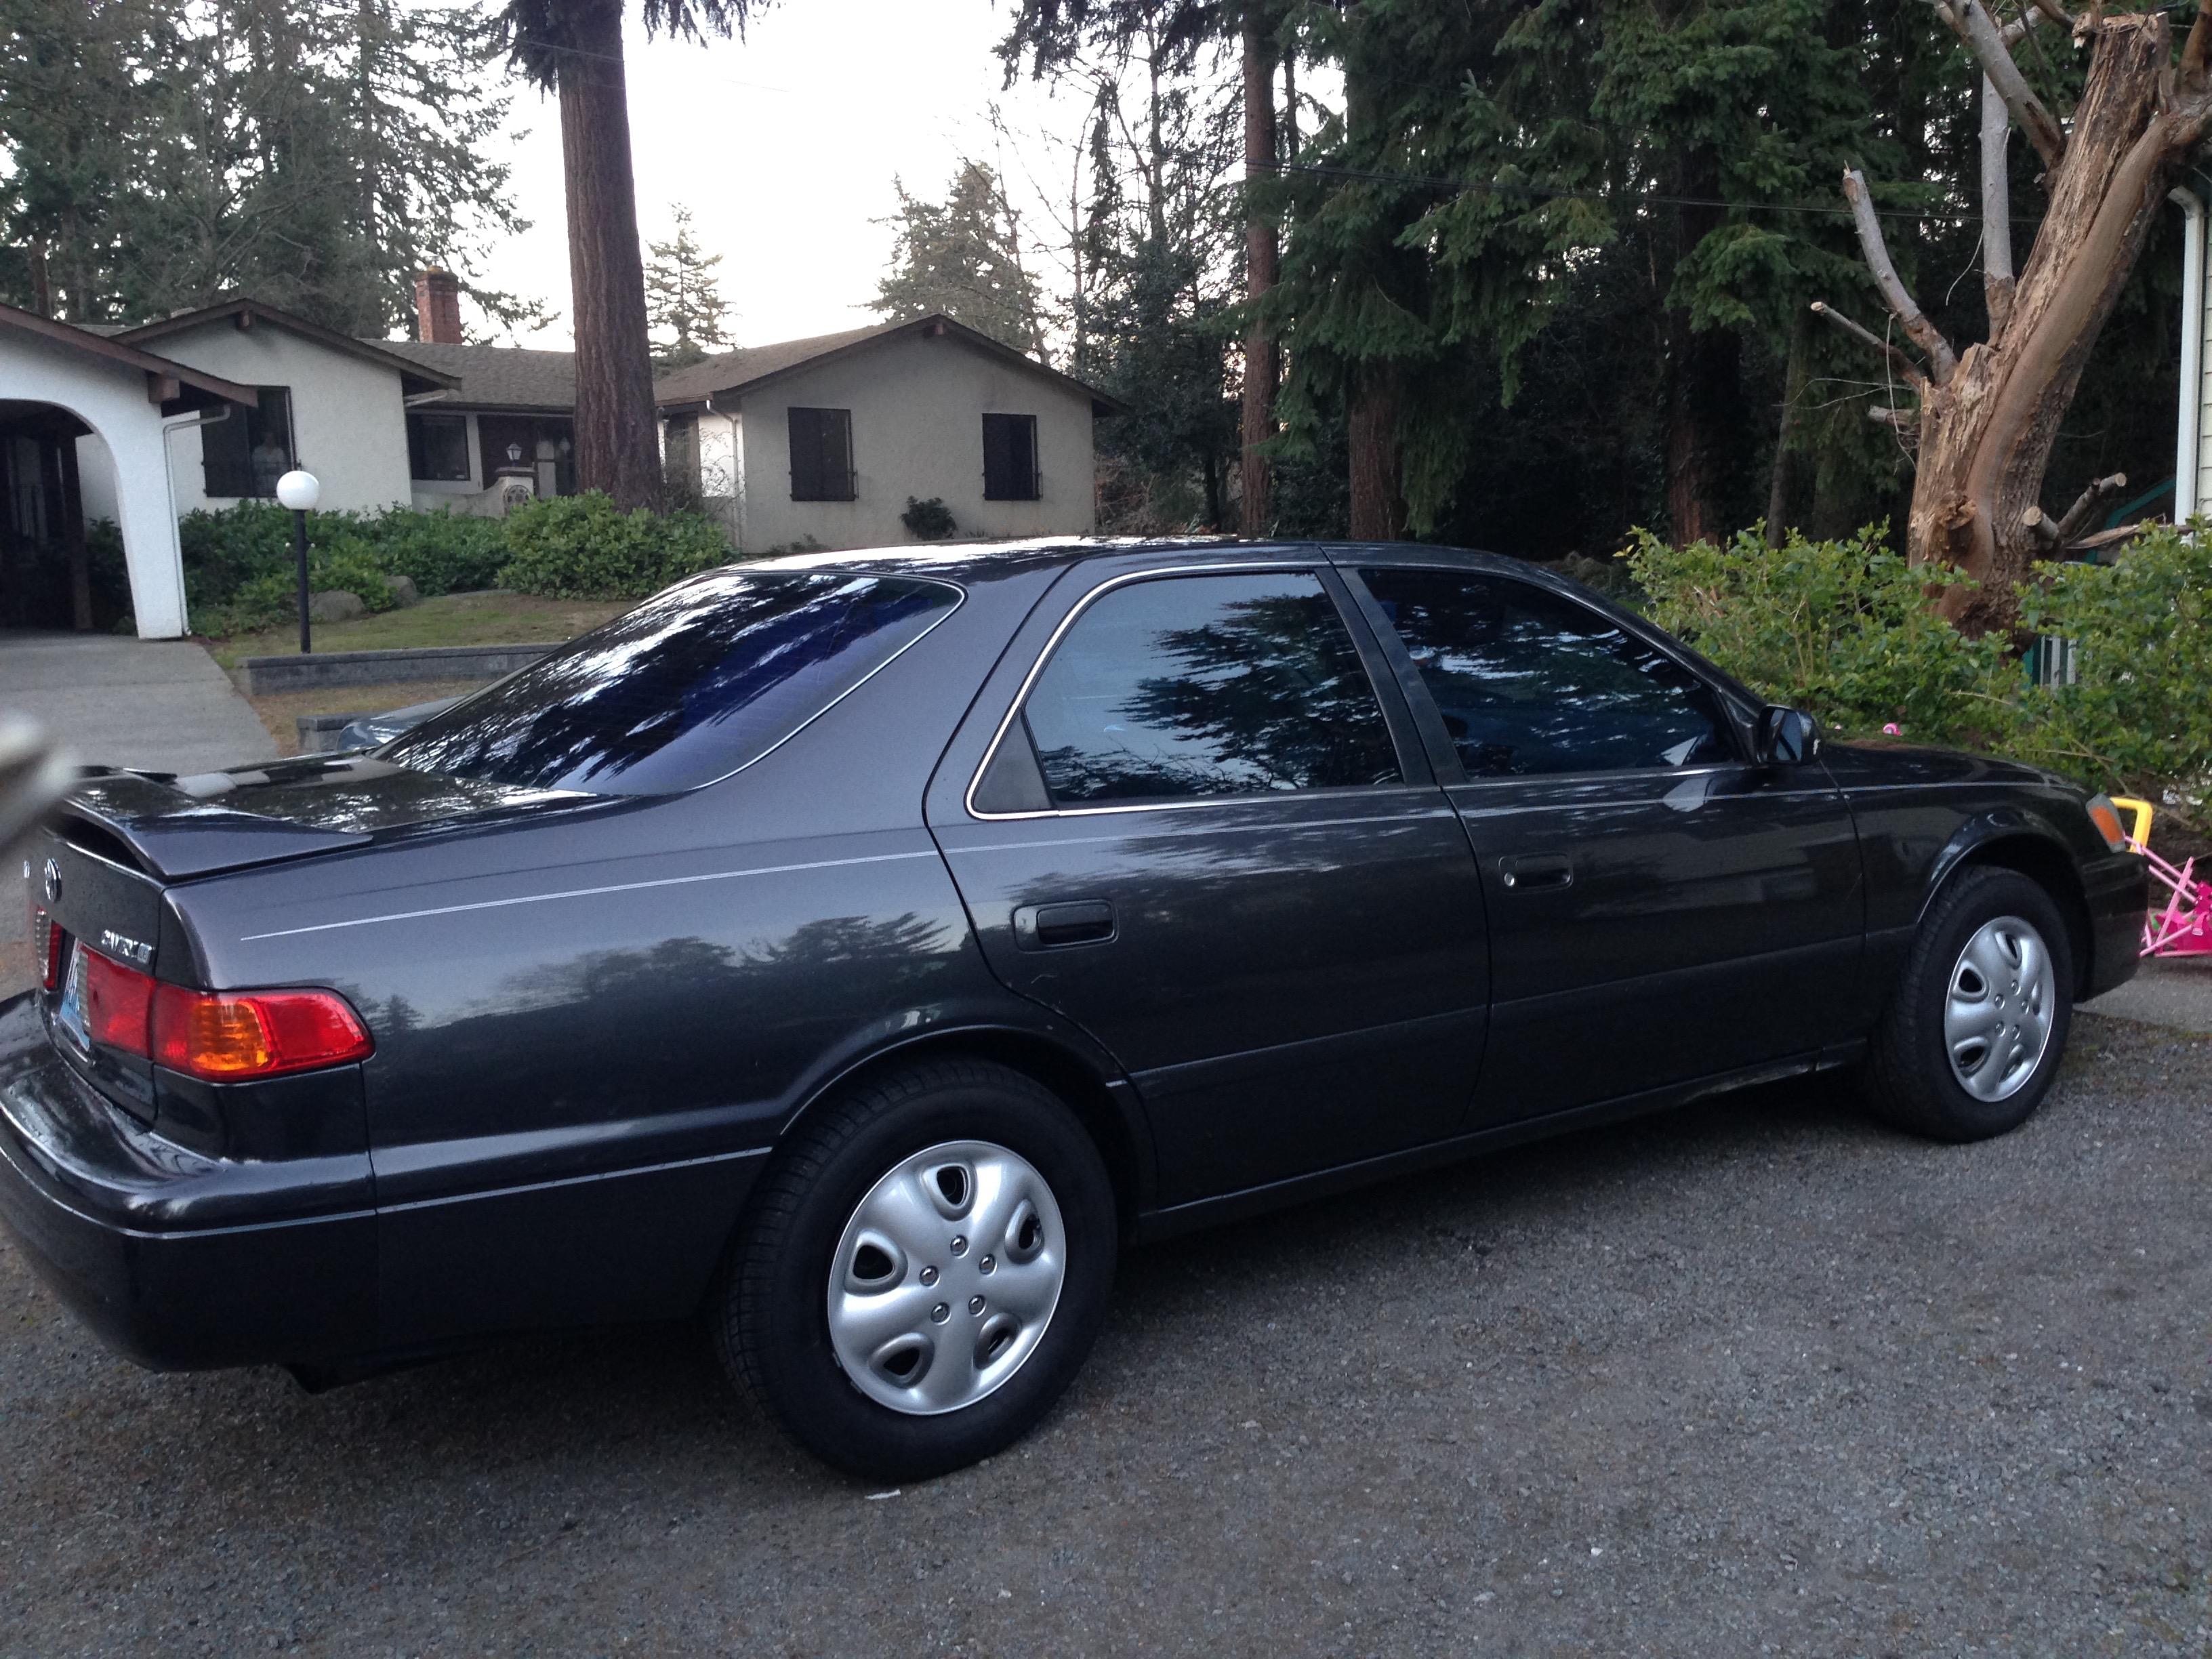 Corpus Christi Subaru >> Cash for Cars Corpus Christi, TX | Sell Your Junk Car | The Clunker Junker